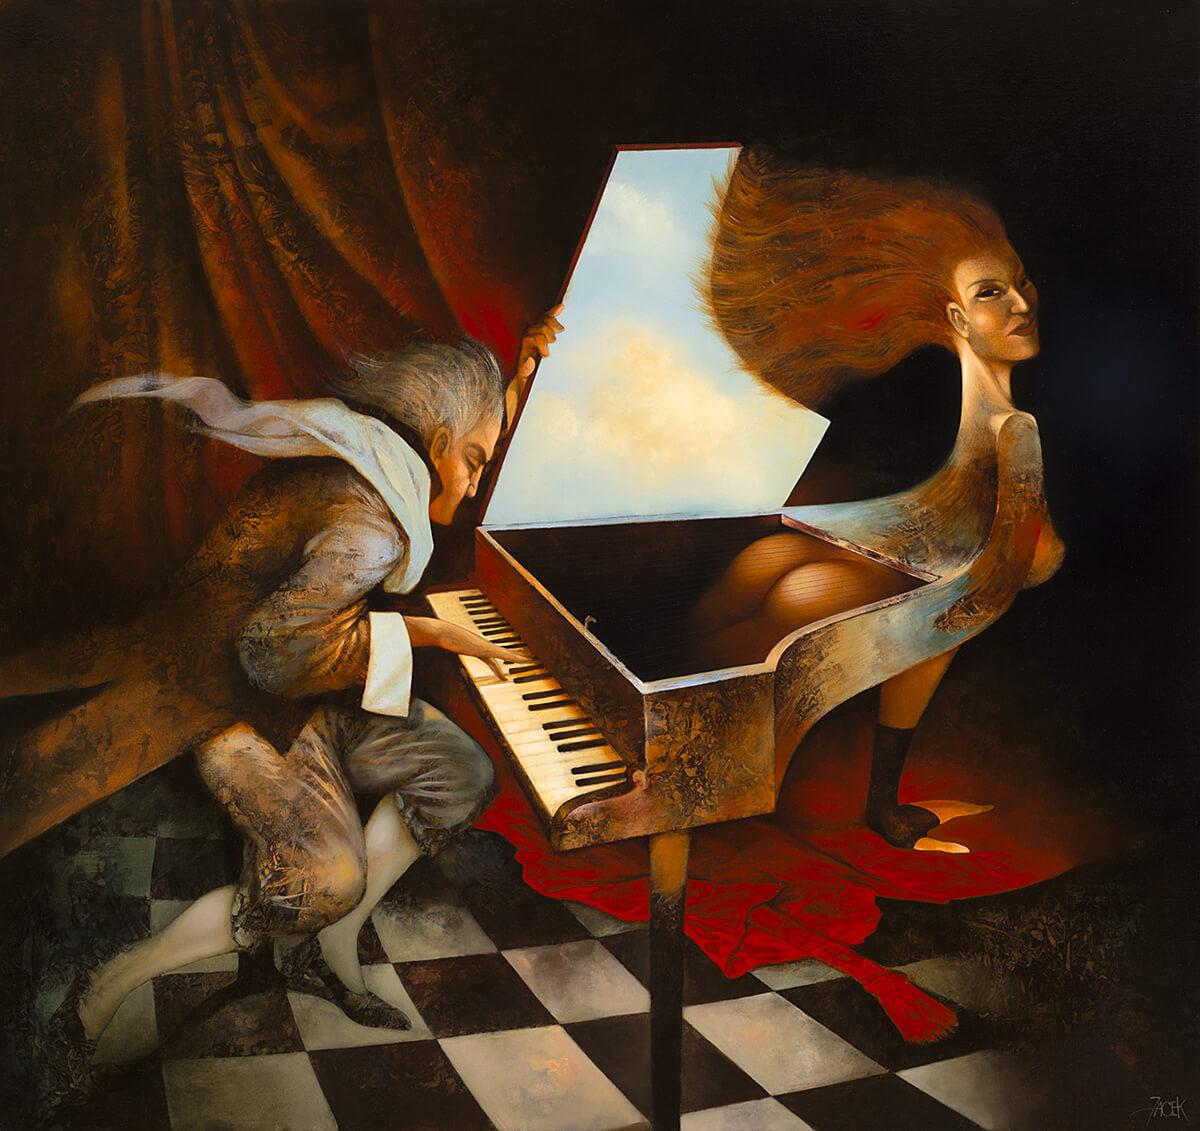 oil on canvas, 80 x 85 cm, 2015